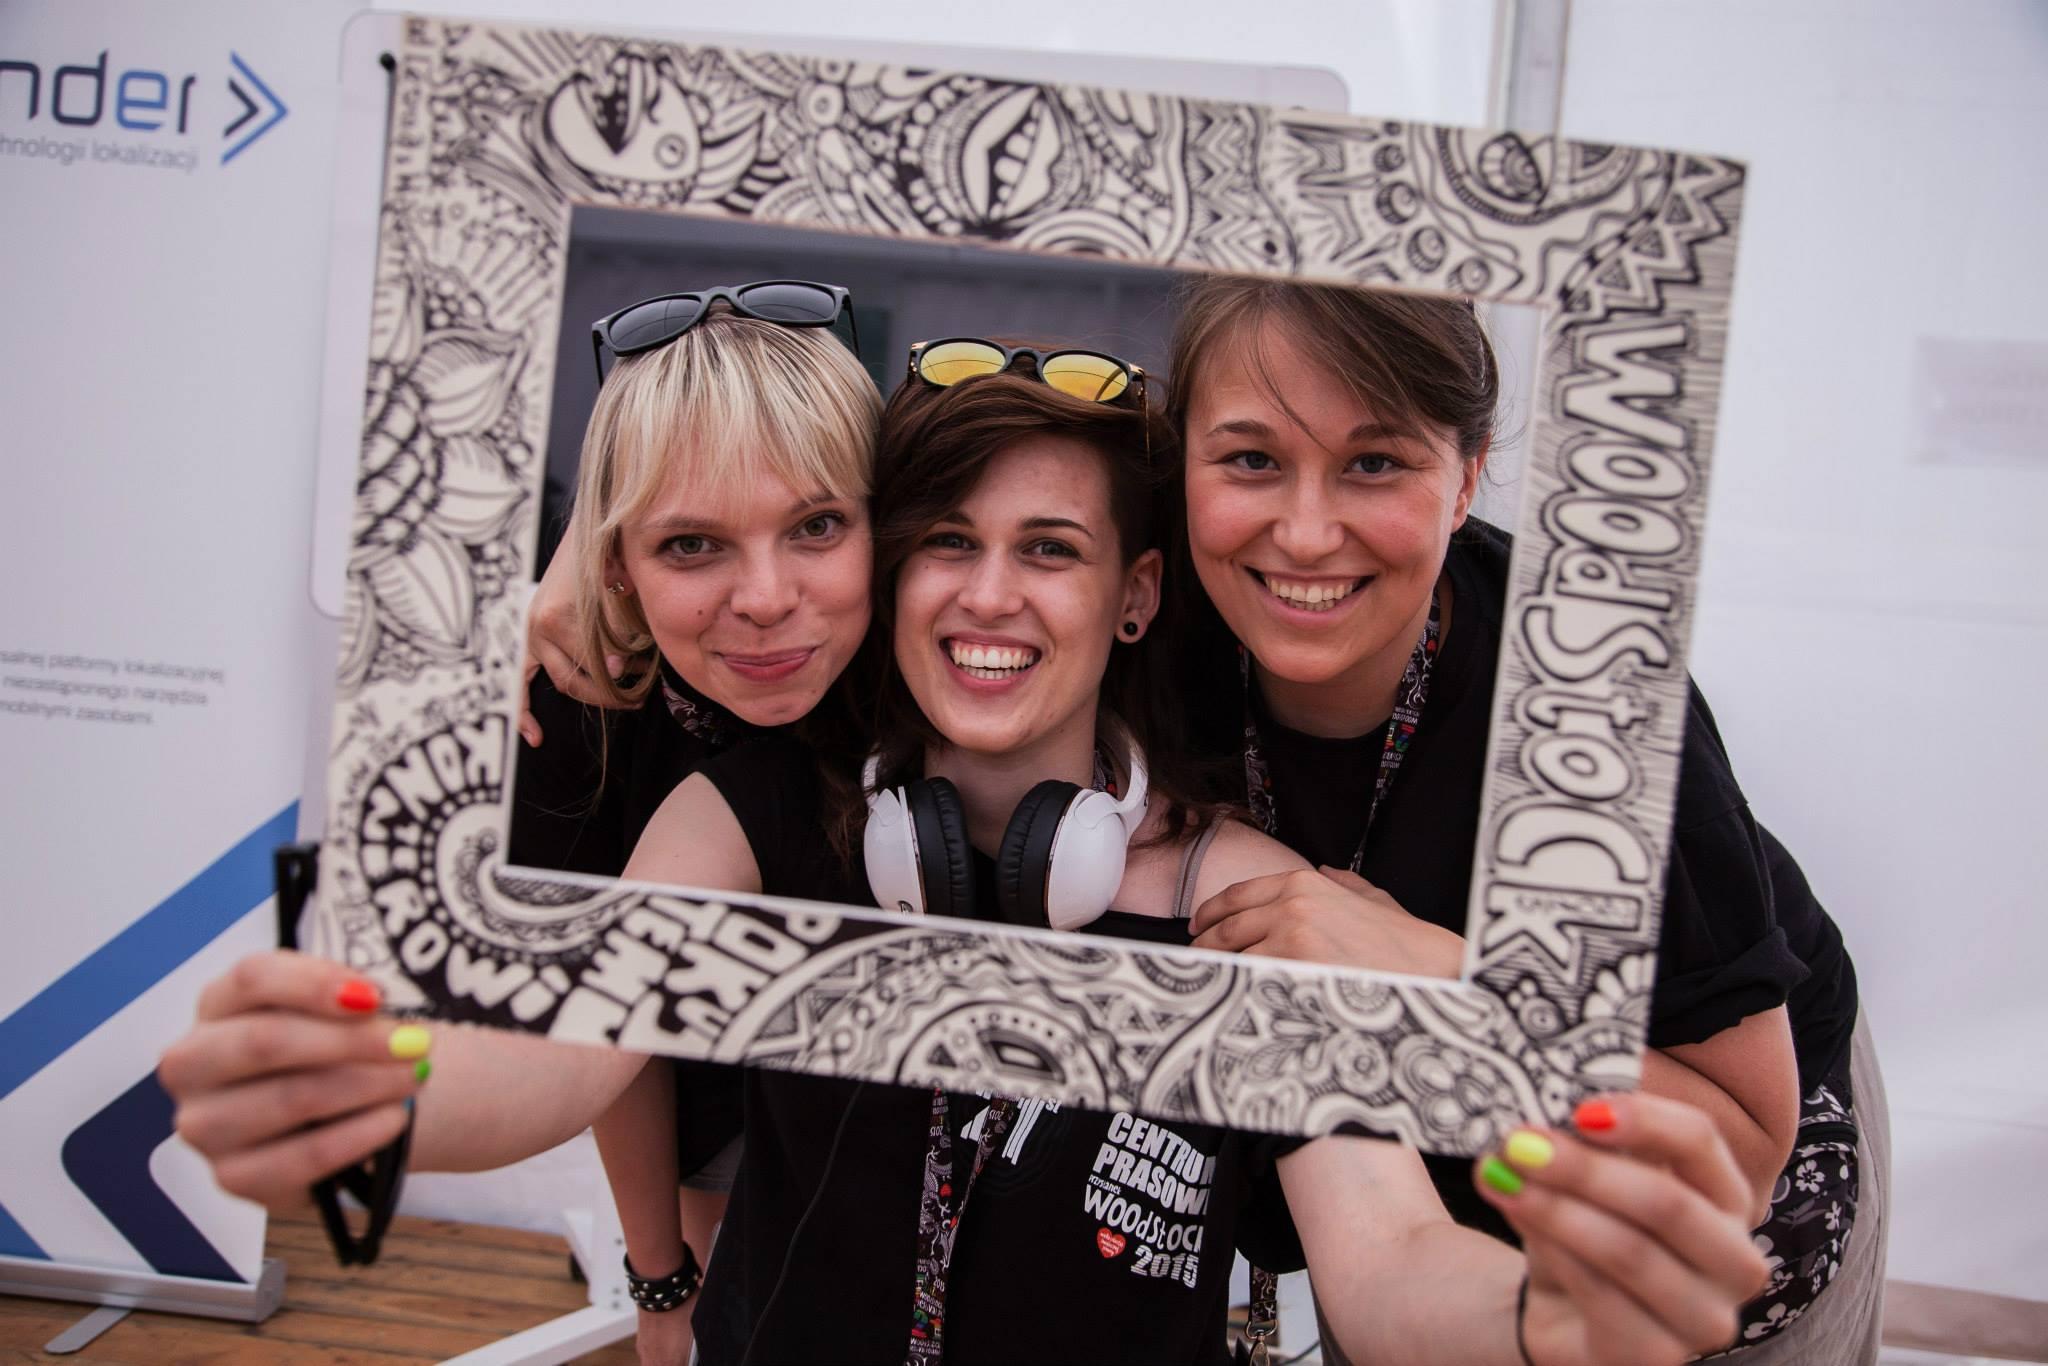 Przystanek Internet – do zobaczenia na Slot Art Festival